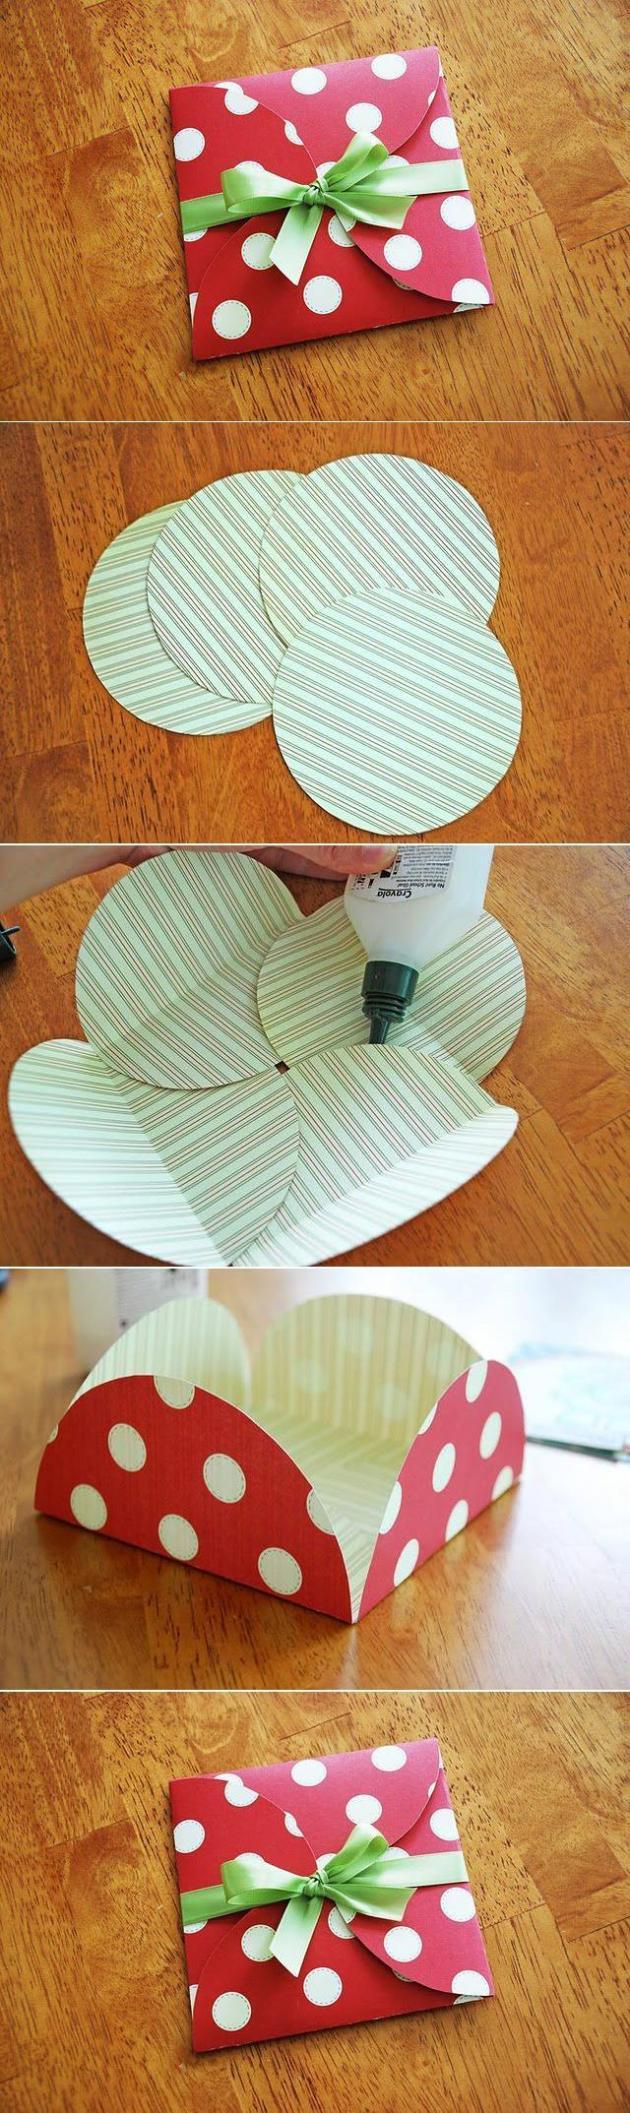 Source : Useful DIY